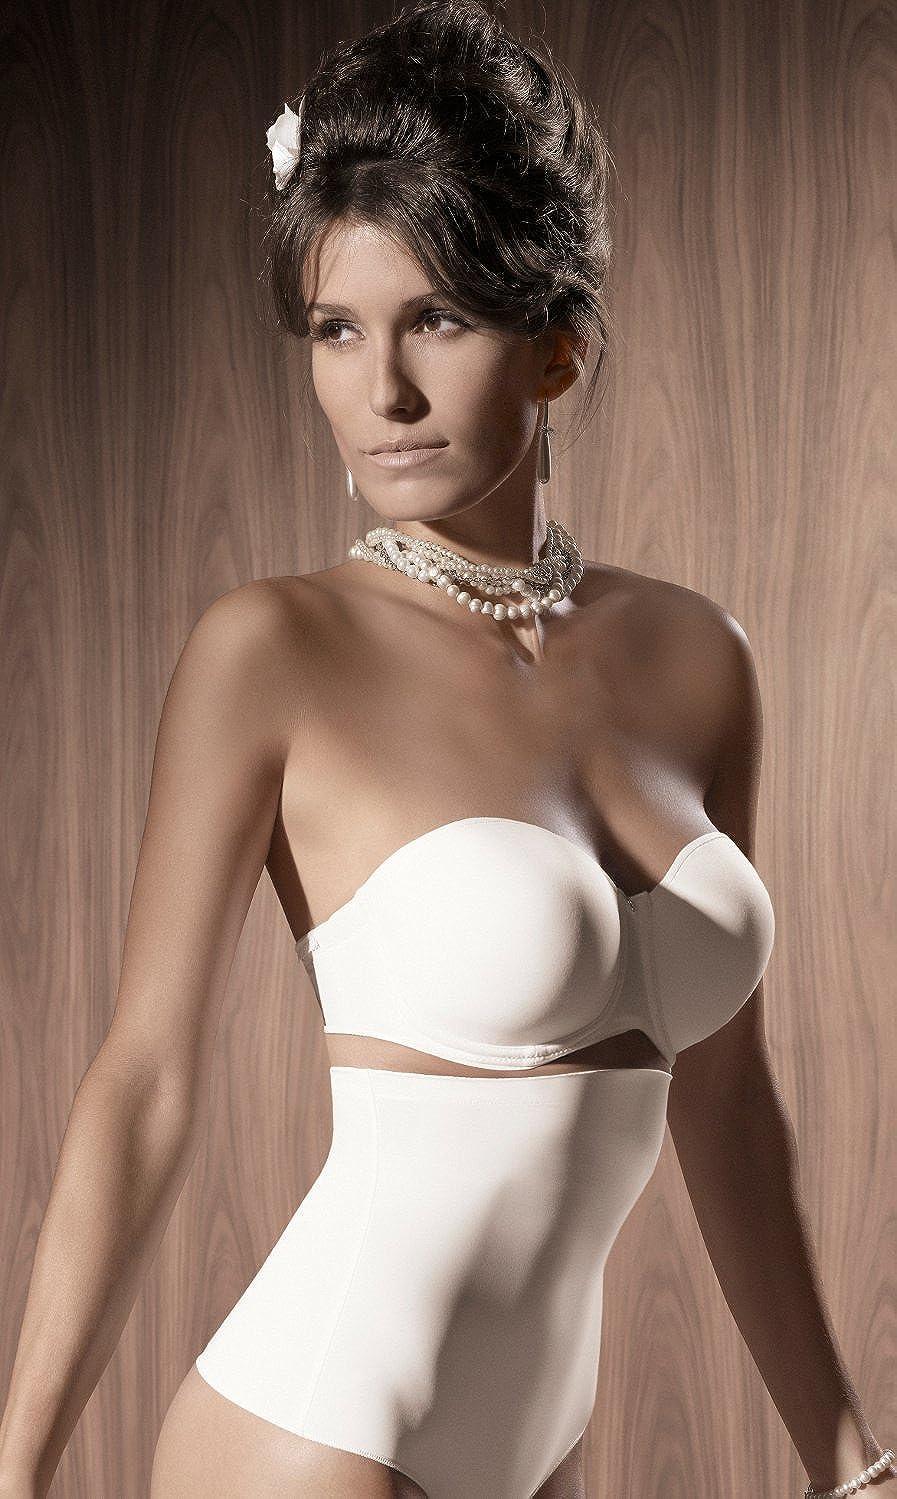 Primadamen Damen BH Perle B005ECTOXS B005ECTOXS B005ECTOXS Klassische BHs Qualitätskleidung 685f4d